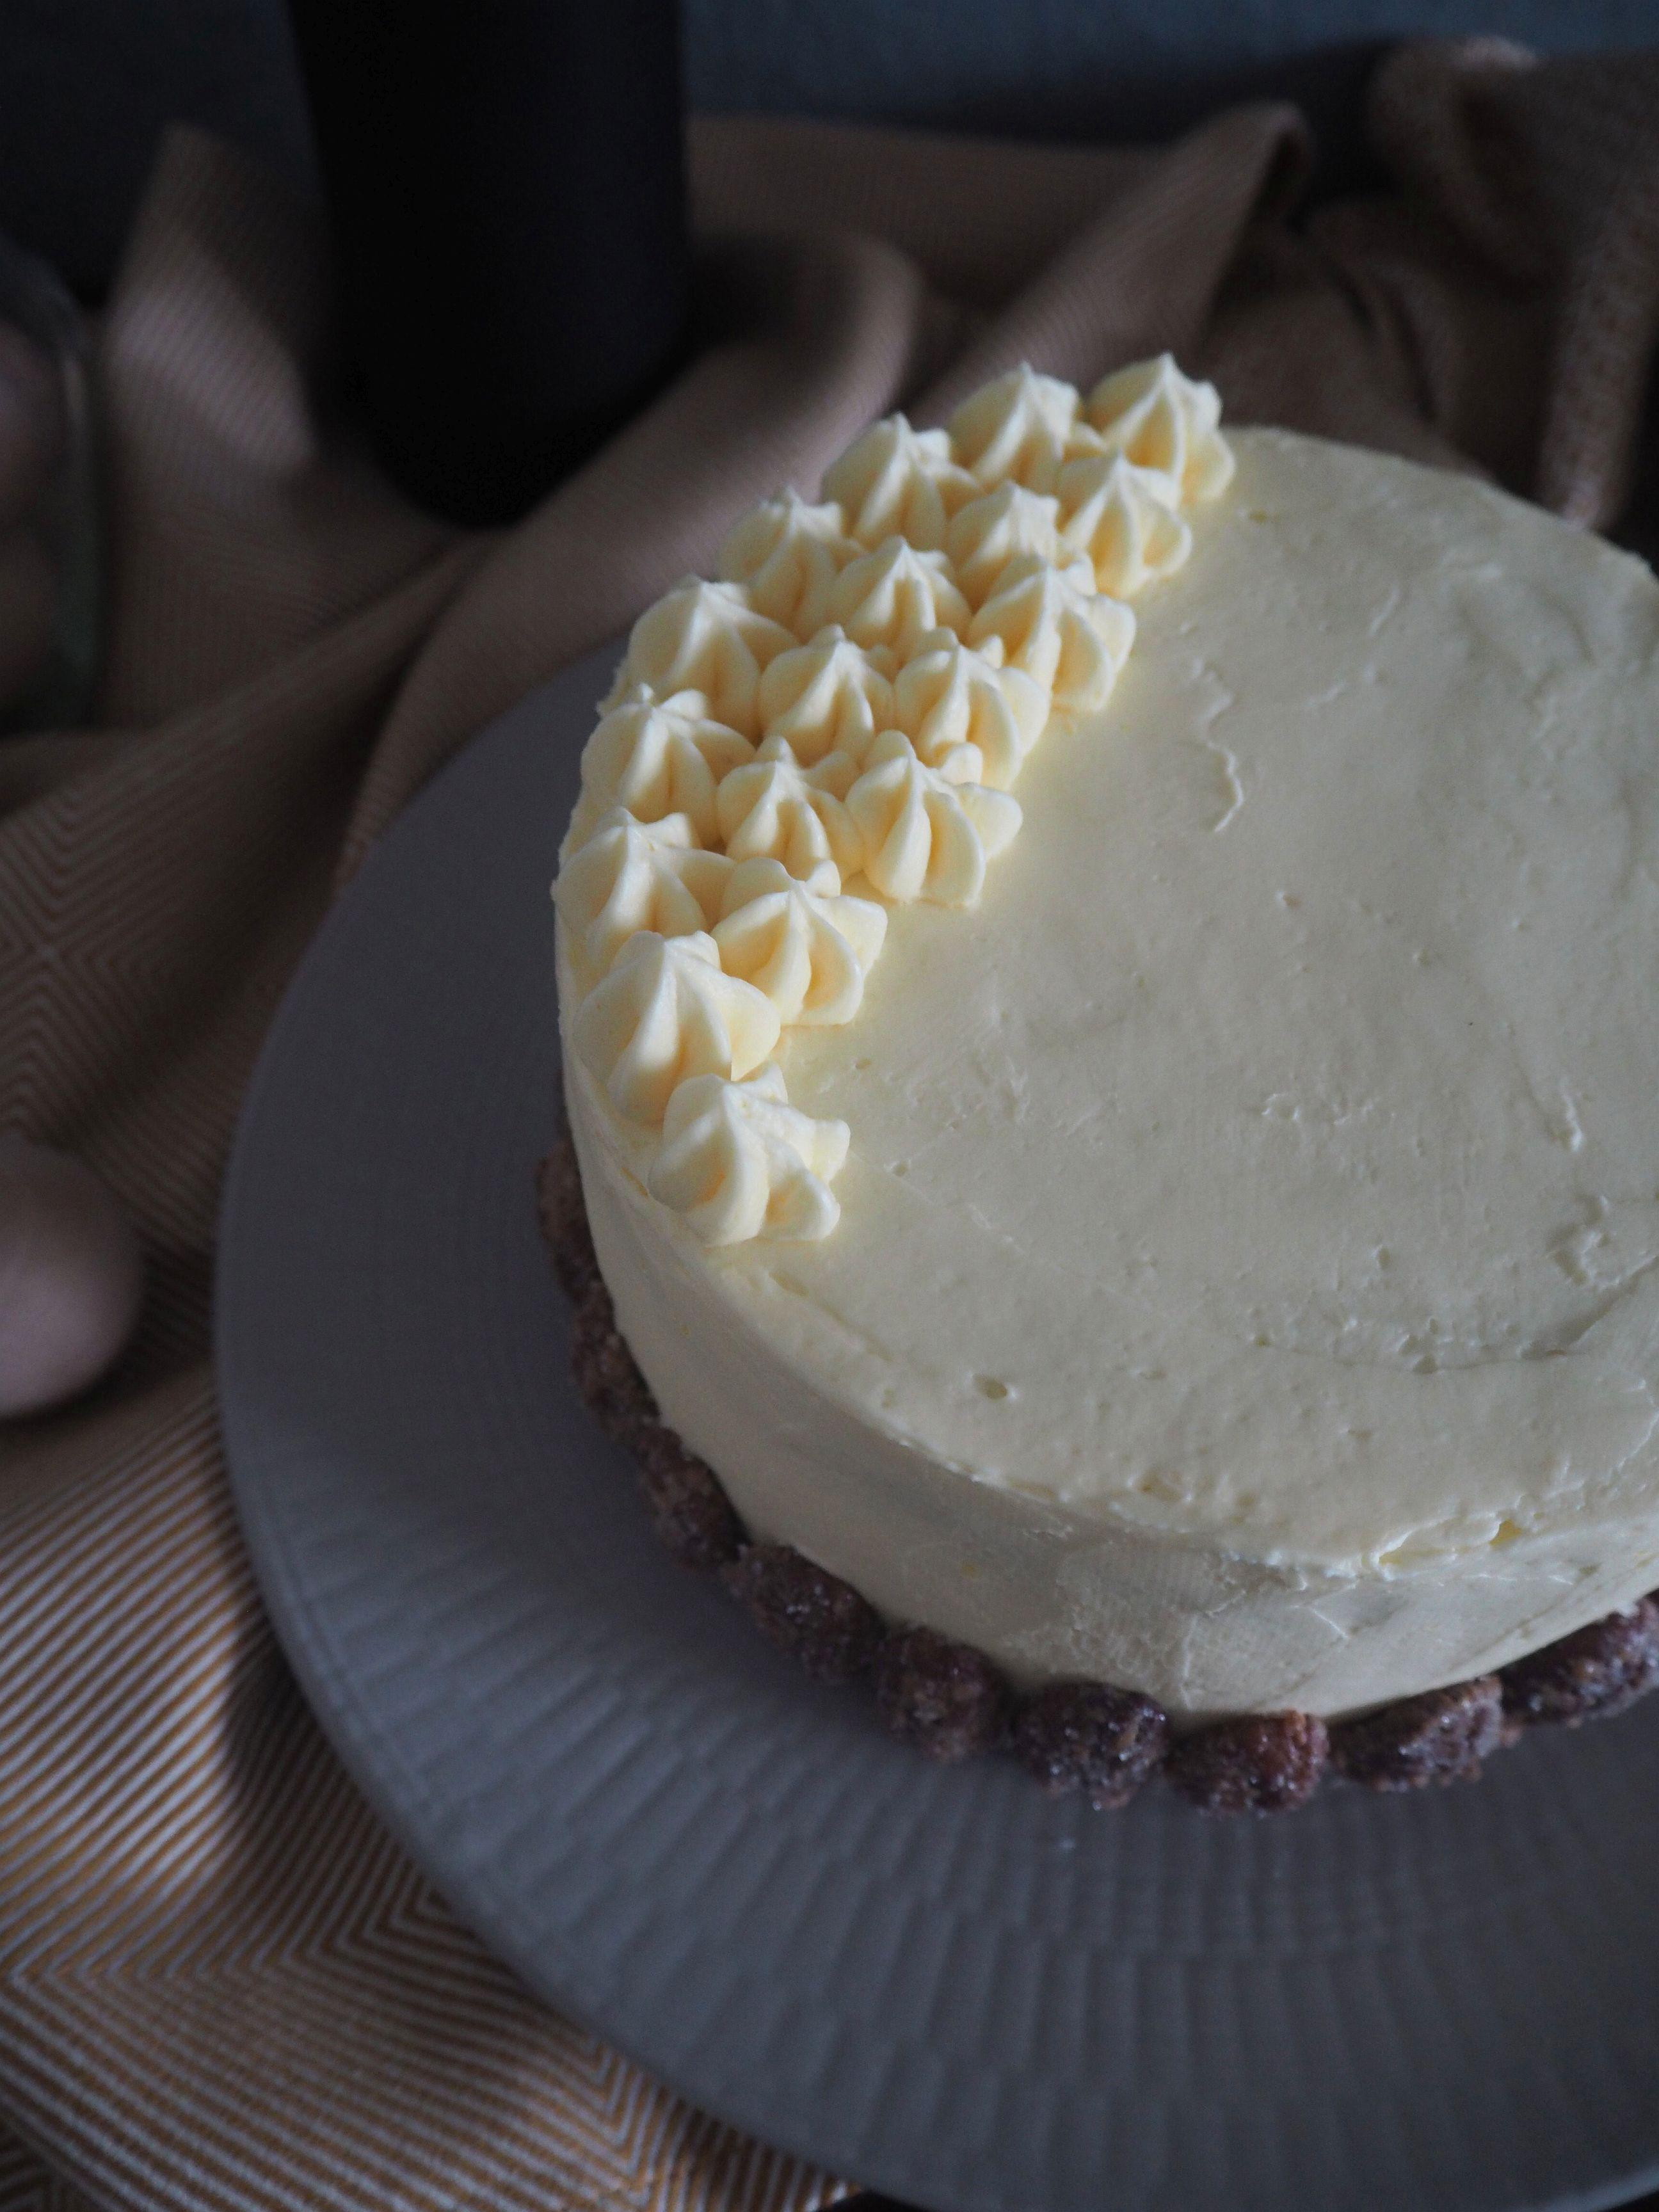 2017-12-skoen-och-kreativ-adventskalender-cookie-and-cake-love-birnen-pekannuss-cake (3)